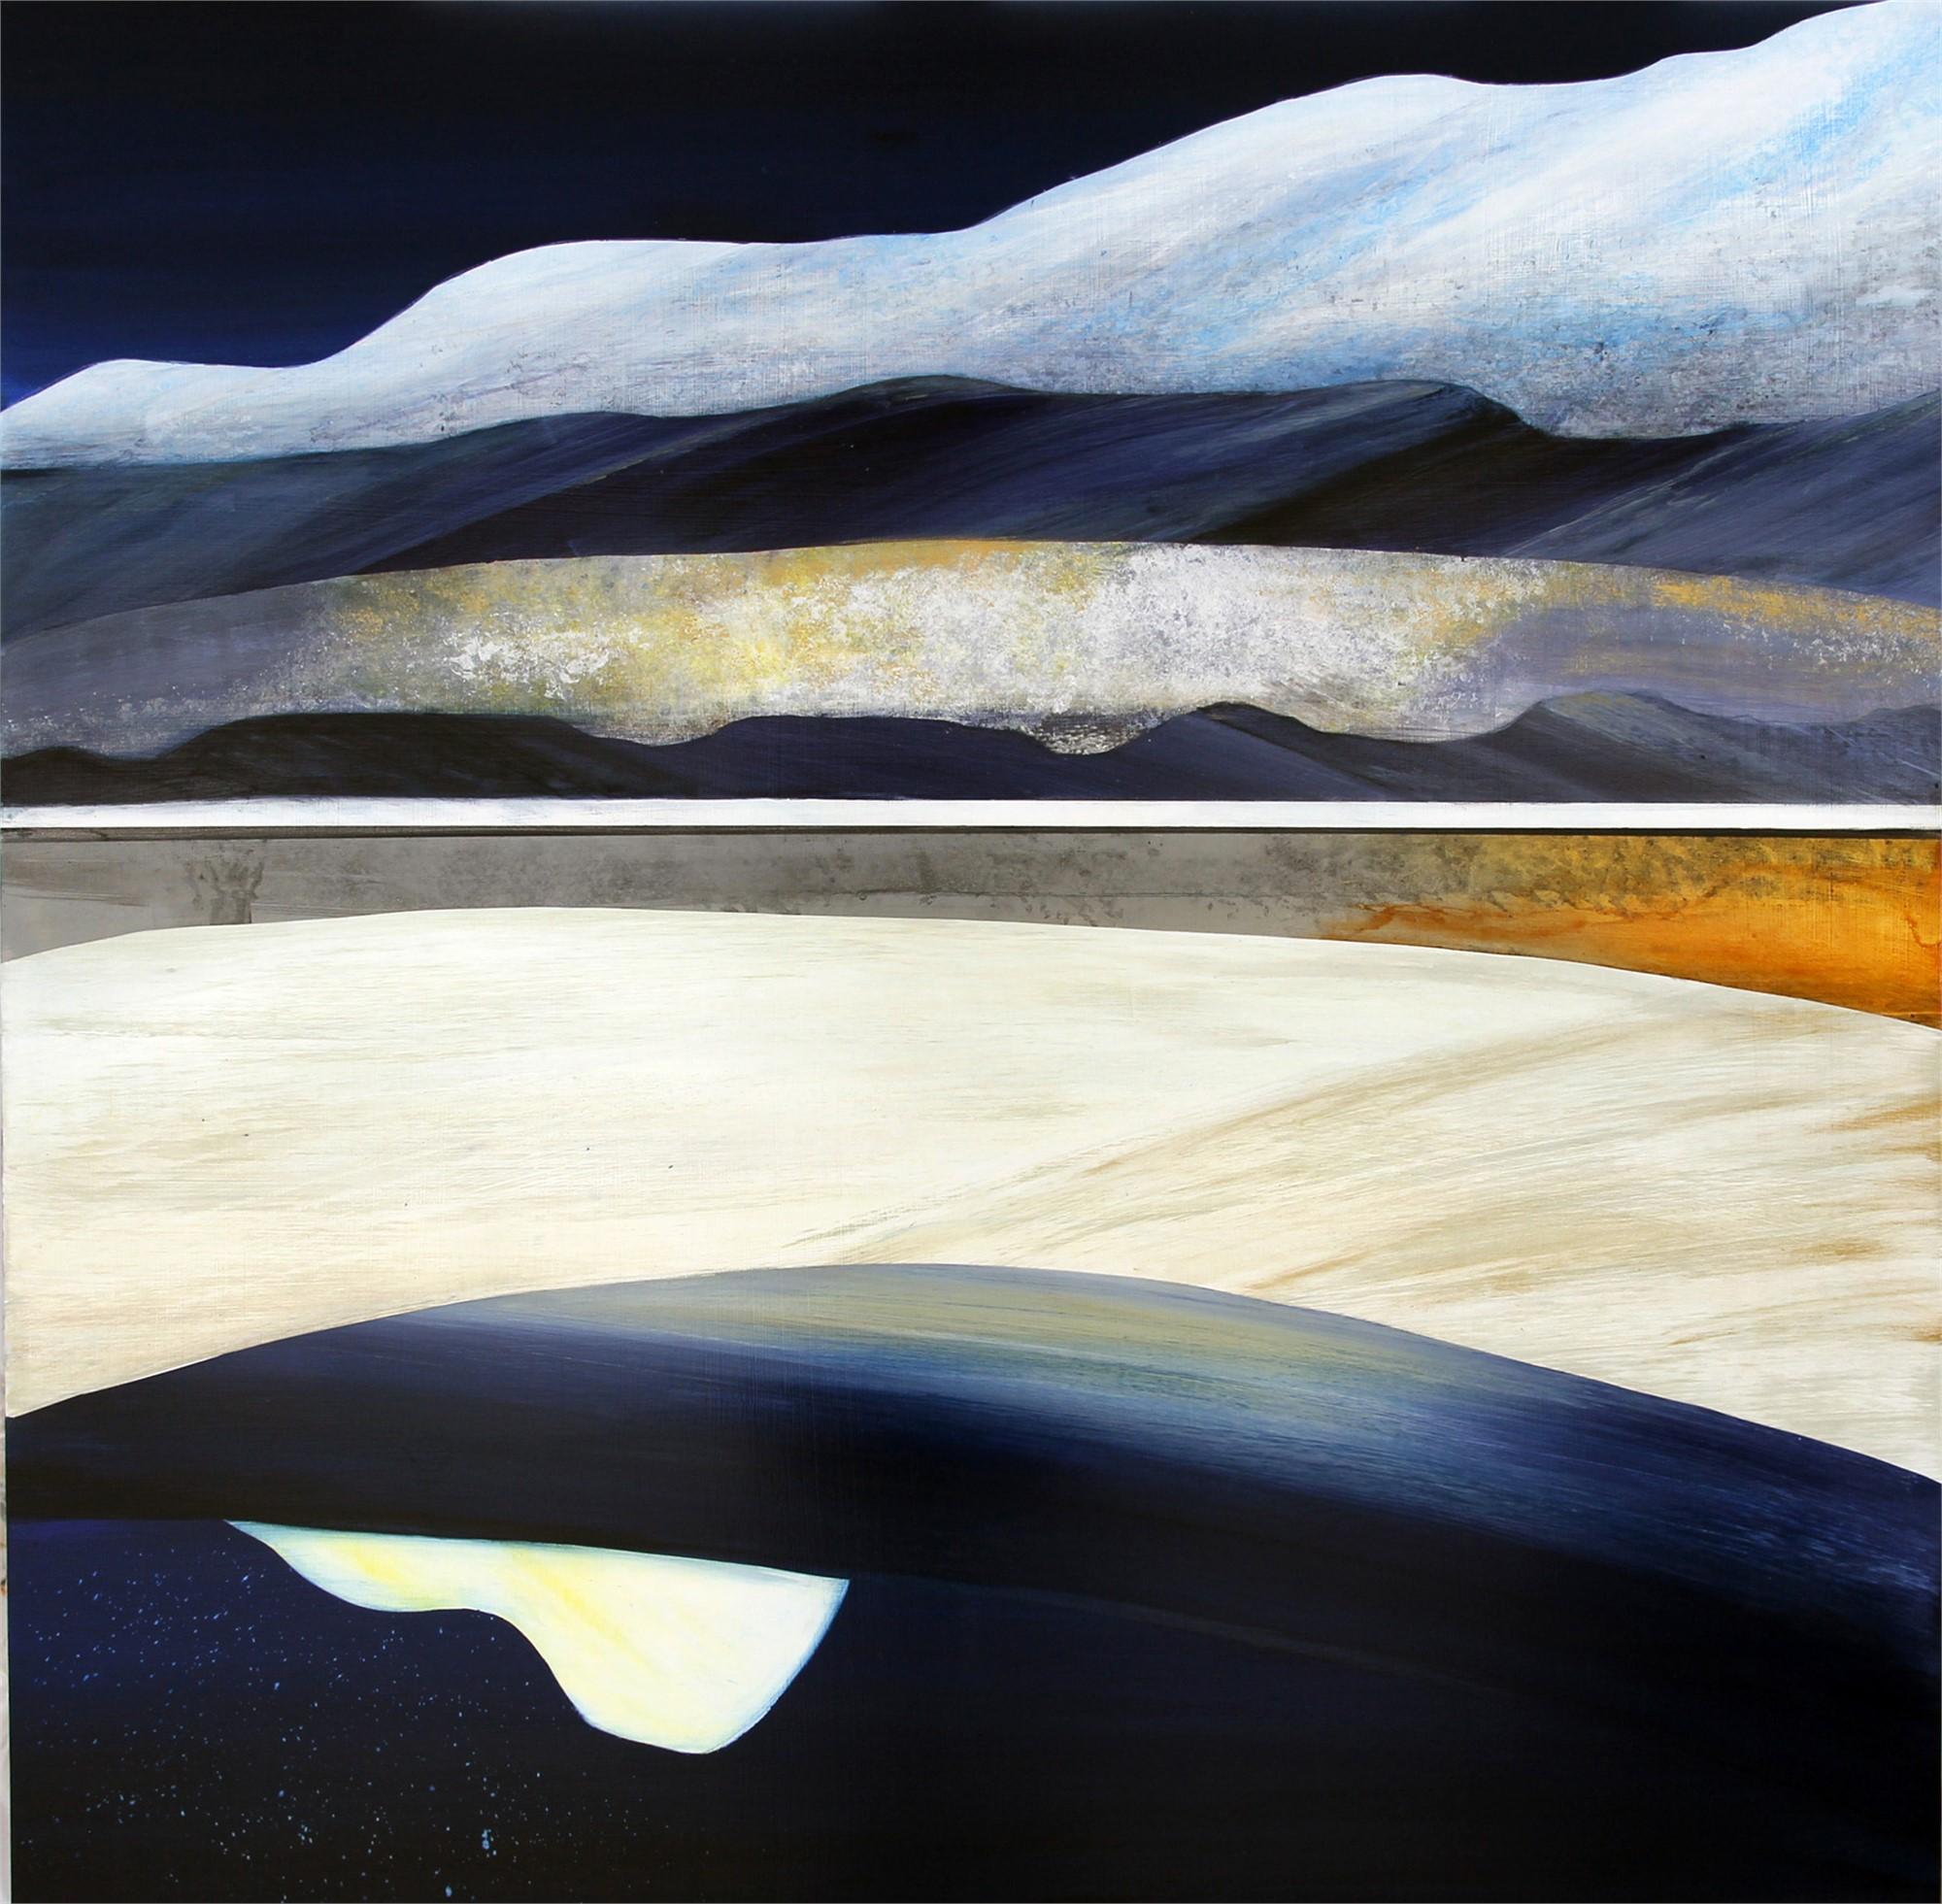 Supermoon Over Kenosha Pass by Sarah Winkler